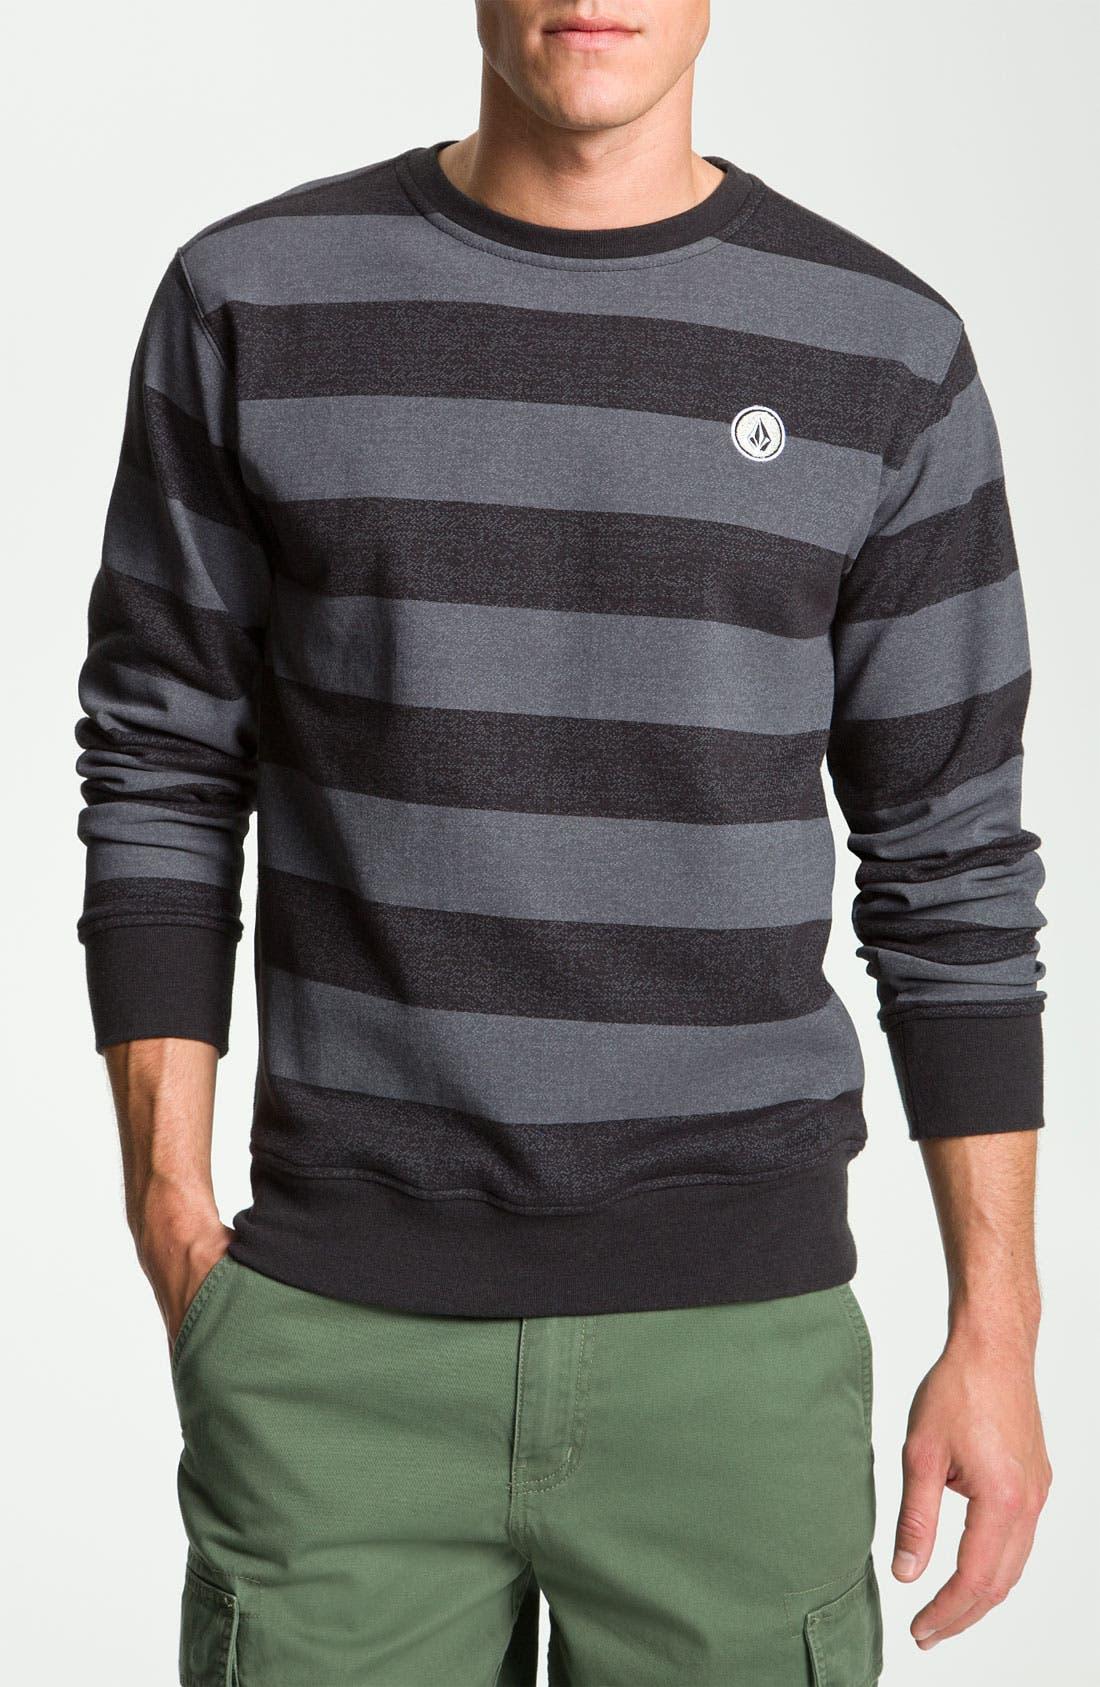 Alternate Image 1 Selected - Volcom 'Eds' Stripe Crewneck Sweatshirt